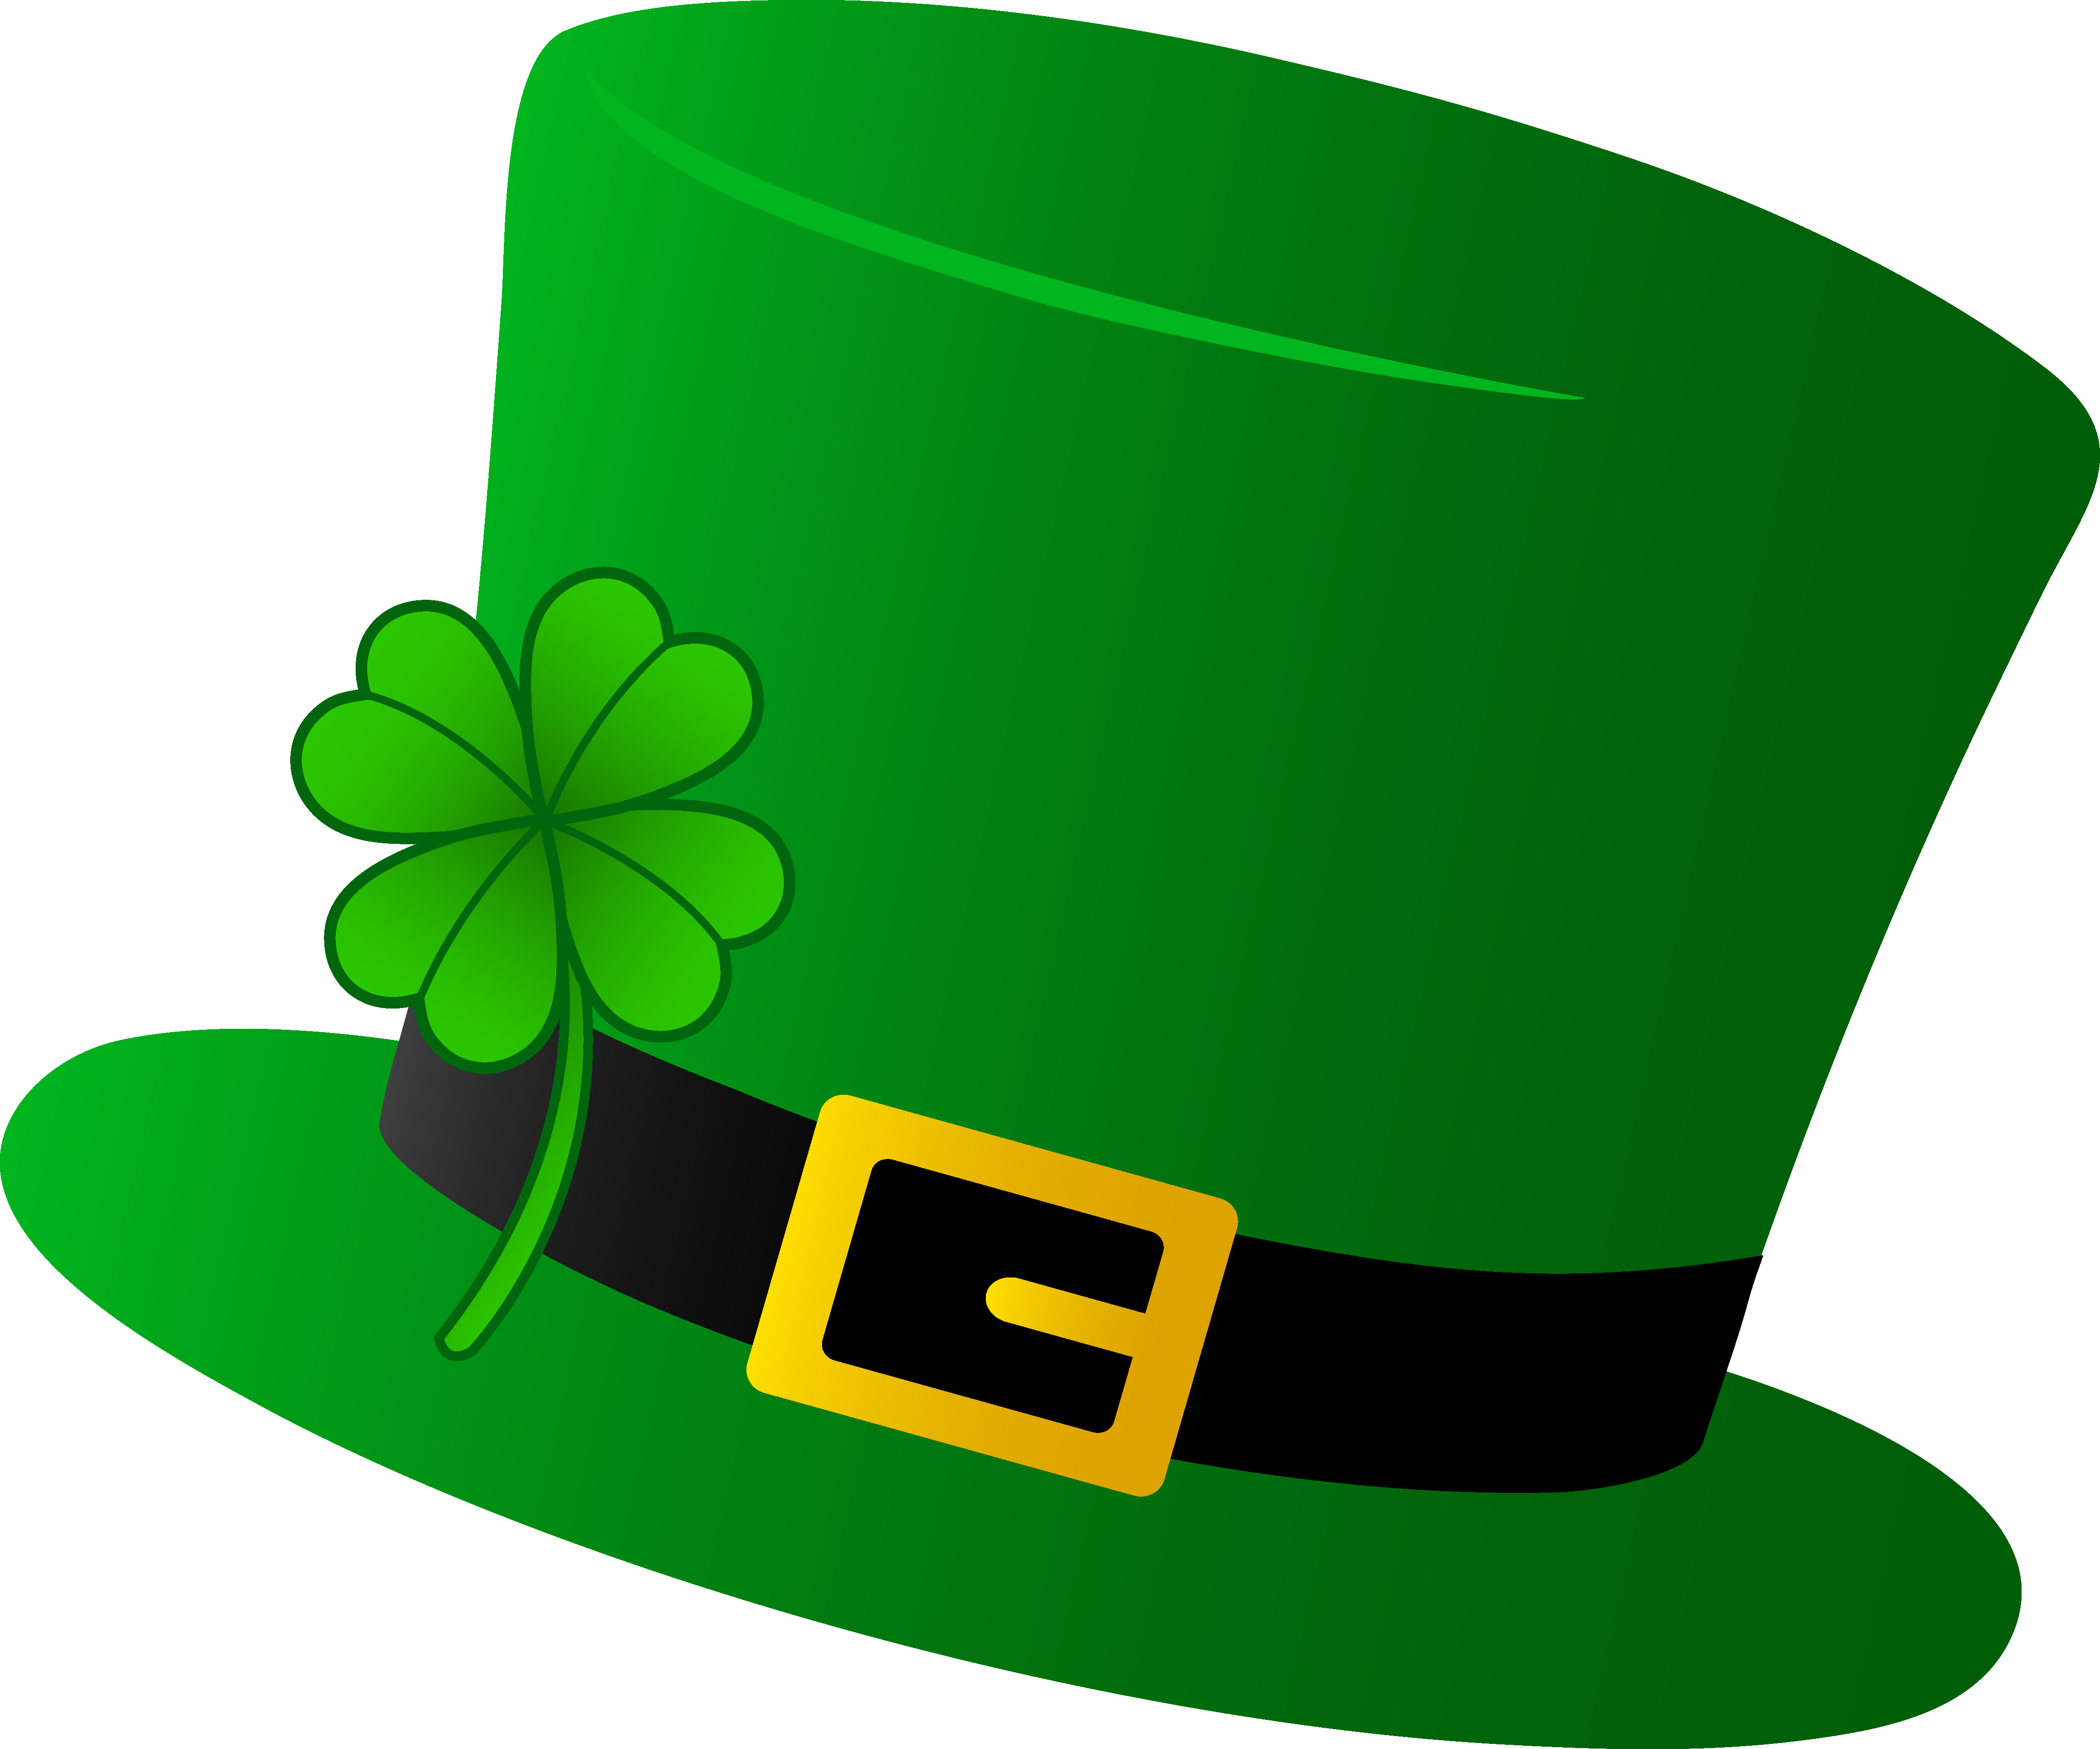 4552x3791 Top 71 Ireland Clip Art